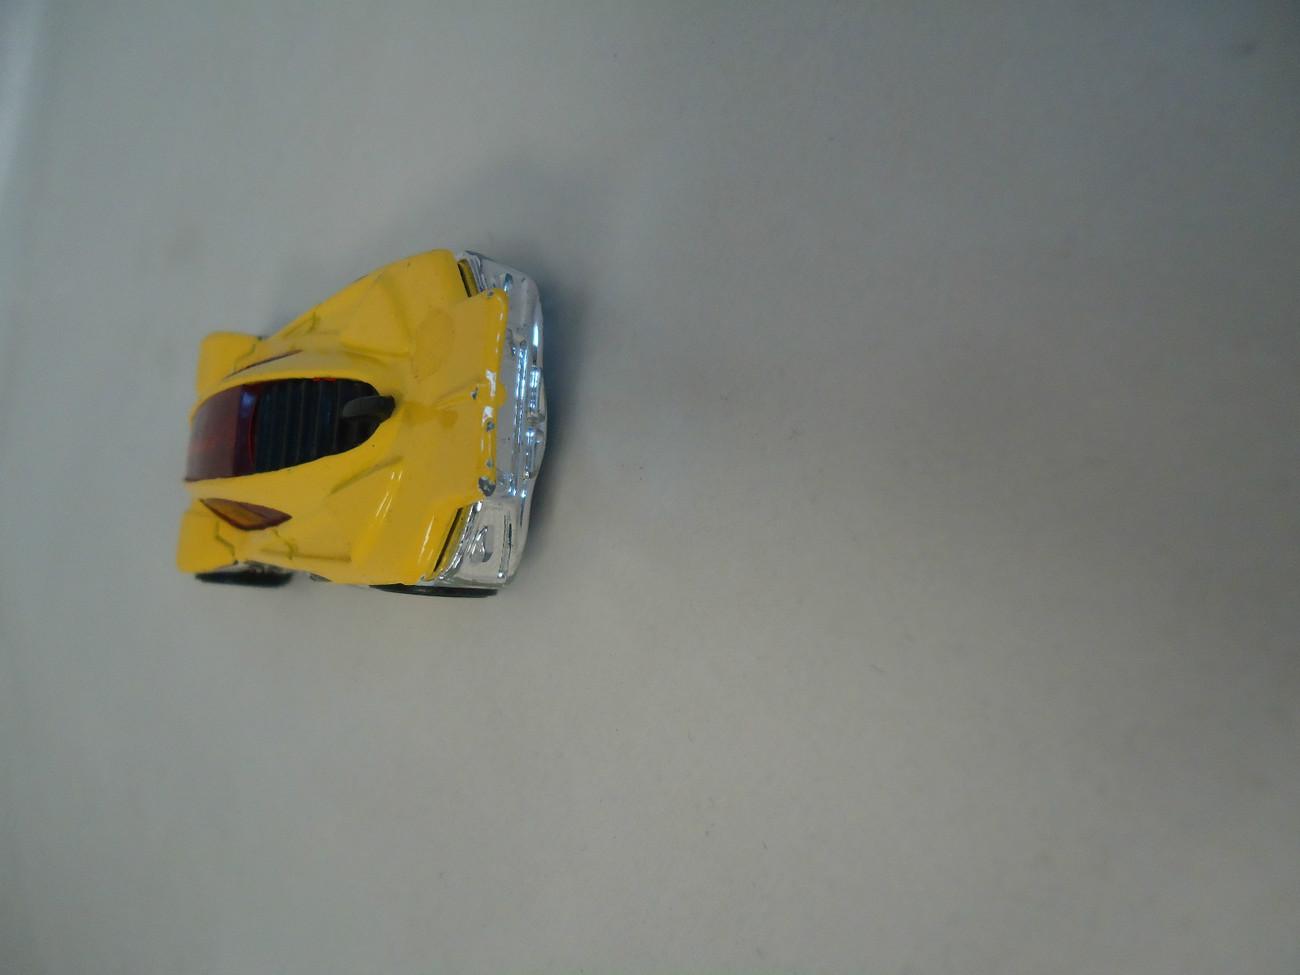 Hot Wheels Side Draft 2001 Mattel Yellow